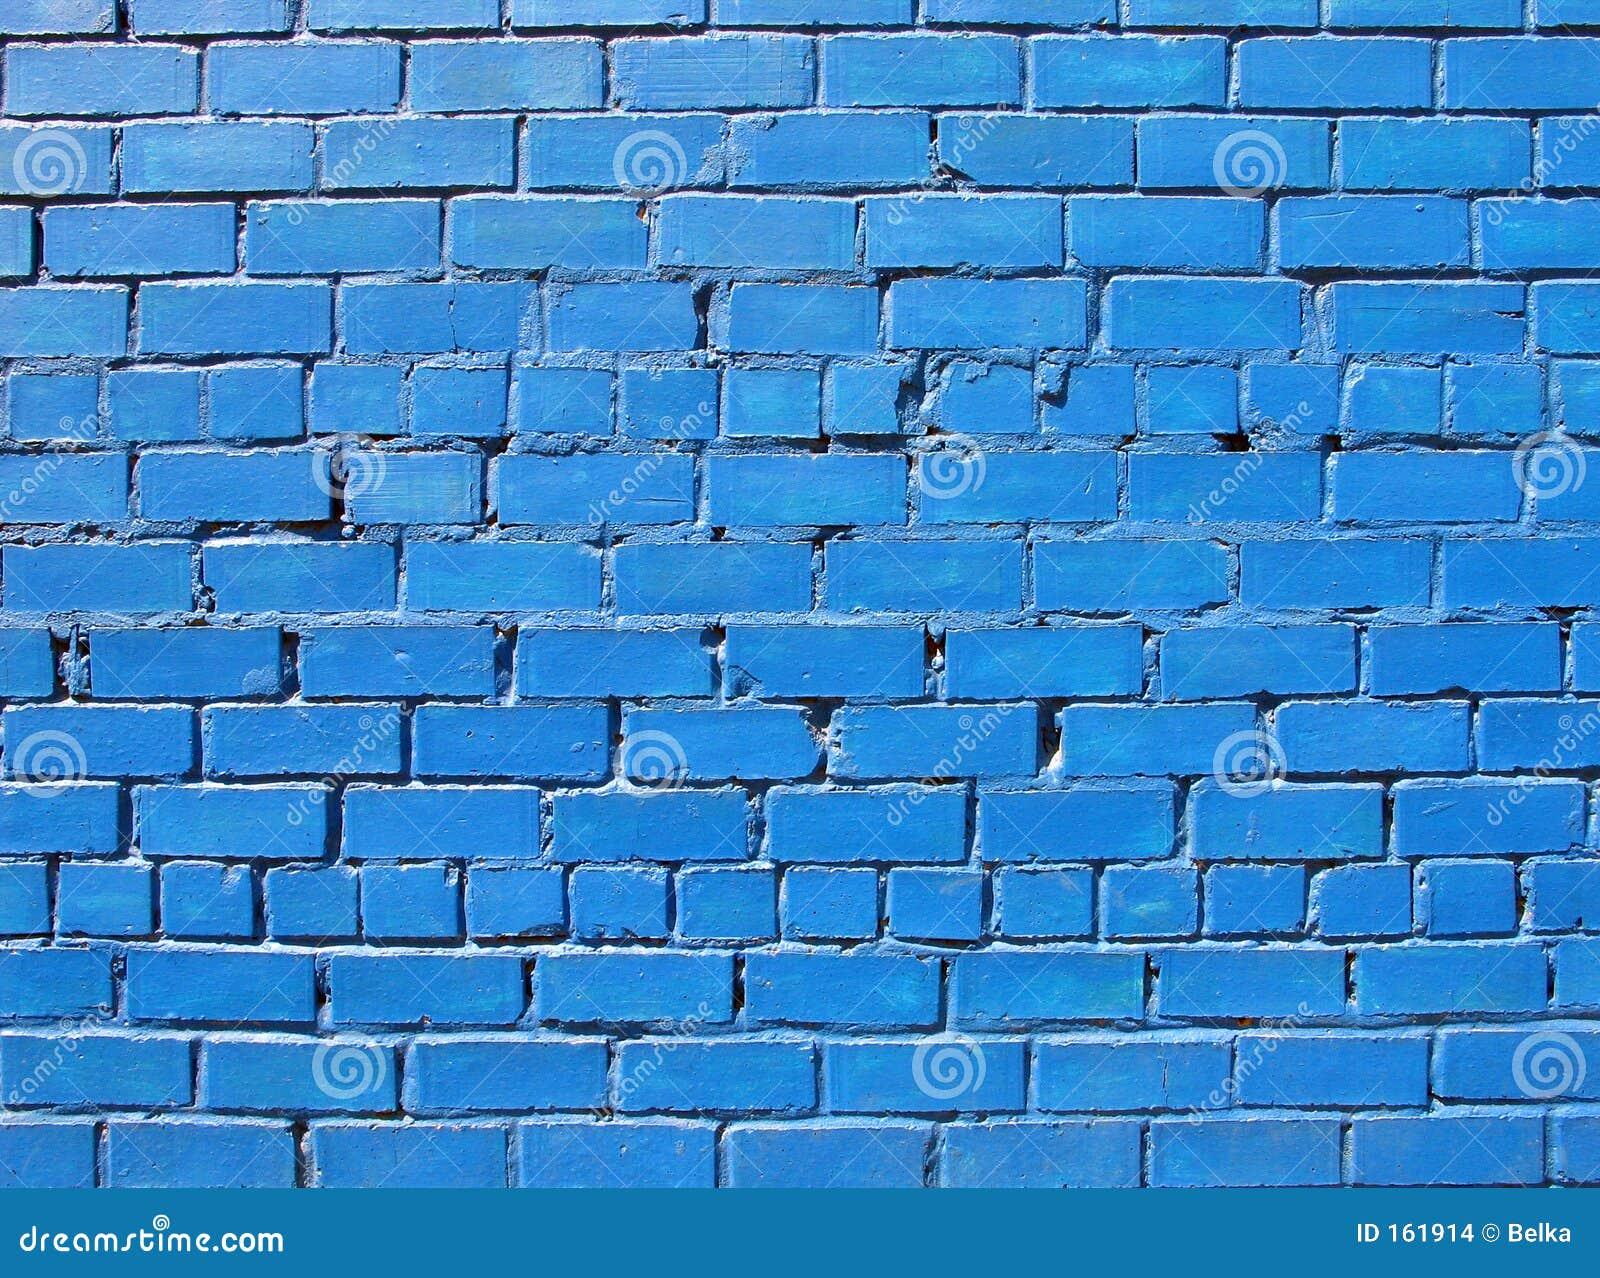 blue wall stock photo image of color bricks colour blue 161914